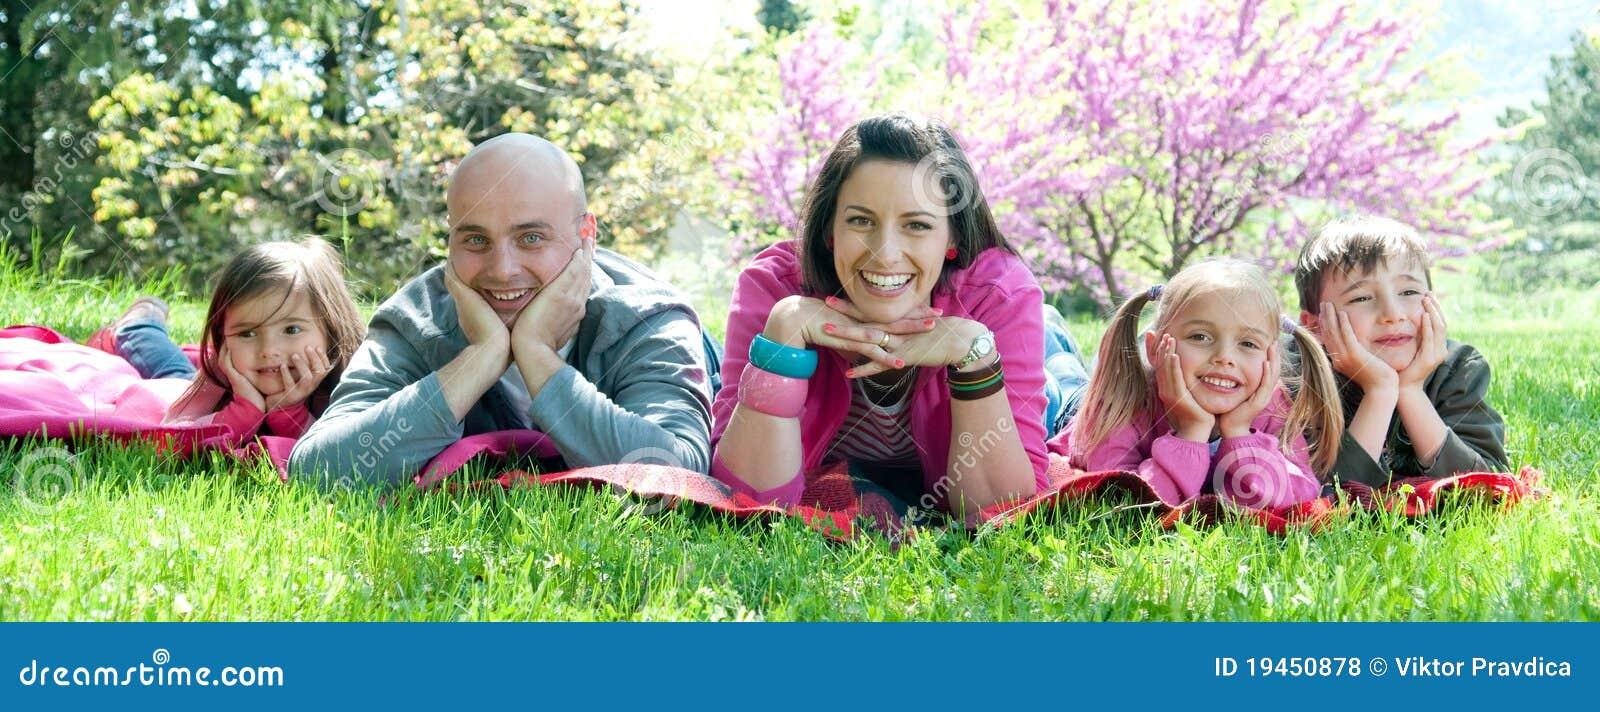 Famille heureuse en nature